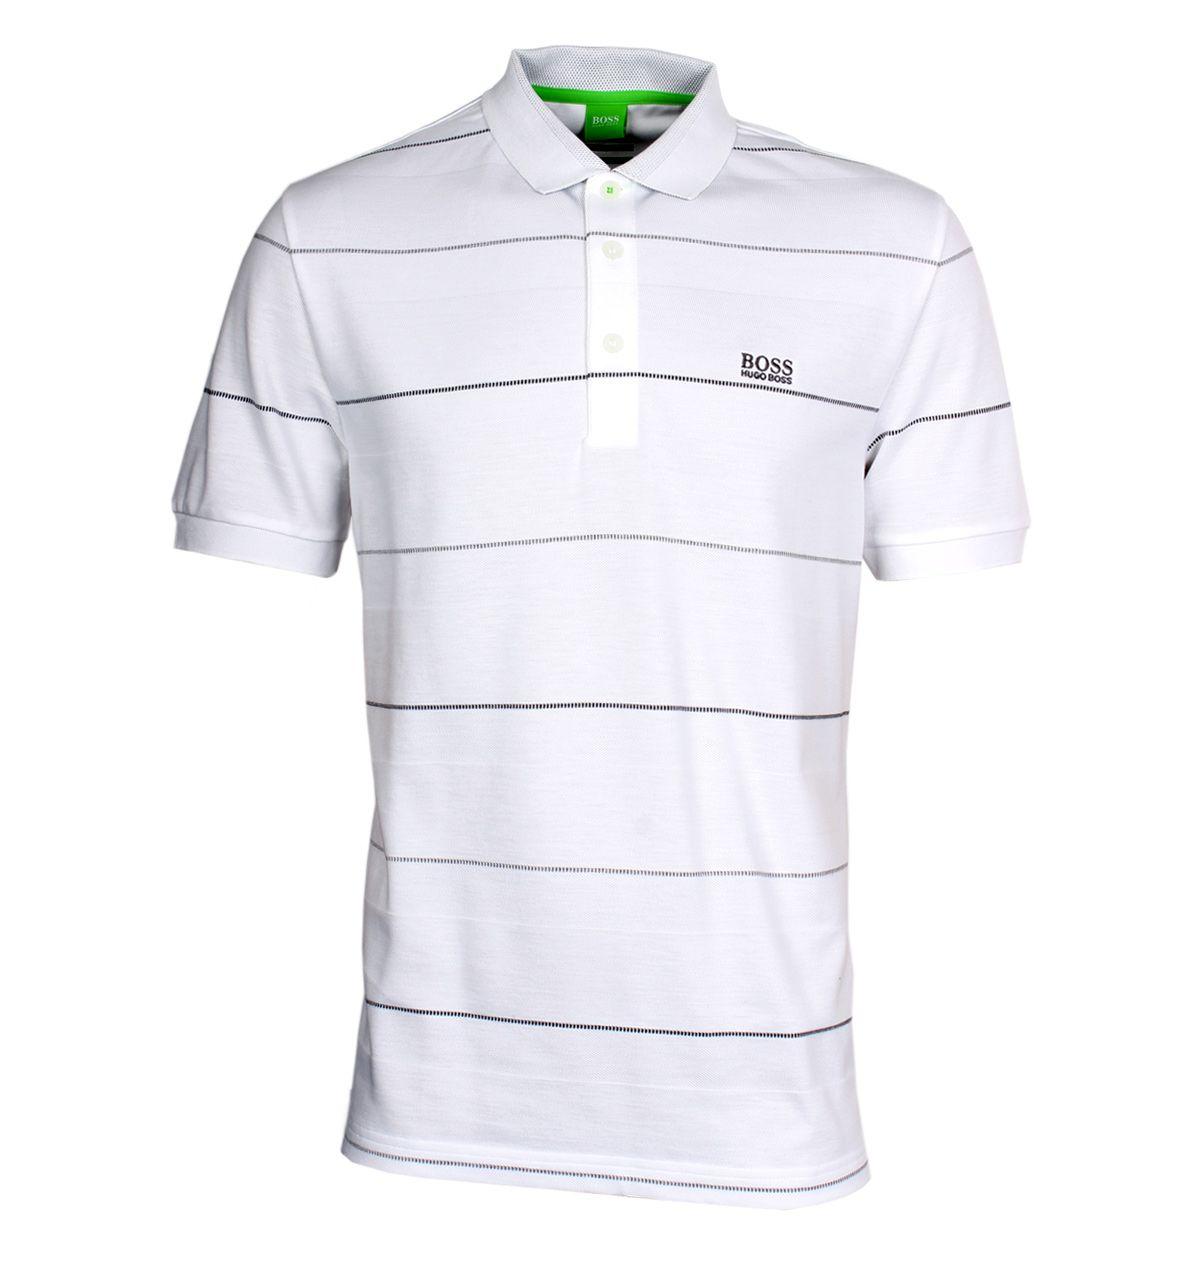 d3f3c4f12 BOSS Green Polo Shirts. BOSS Green Paddy 1 Black Modern Fit Pique Polo Shirt